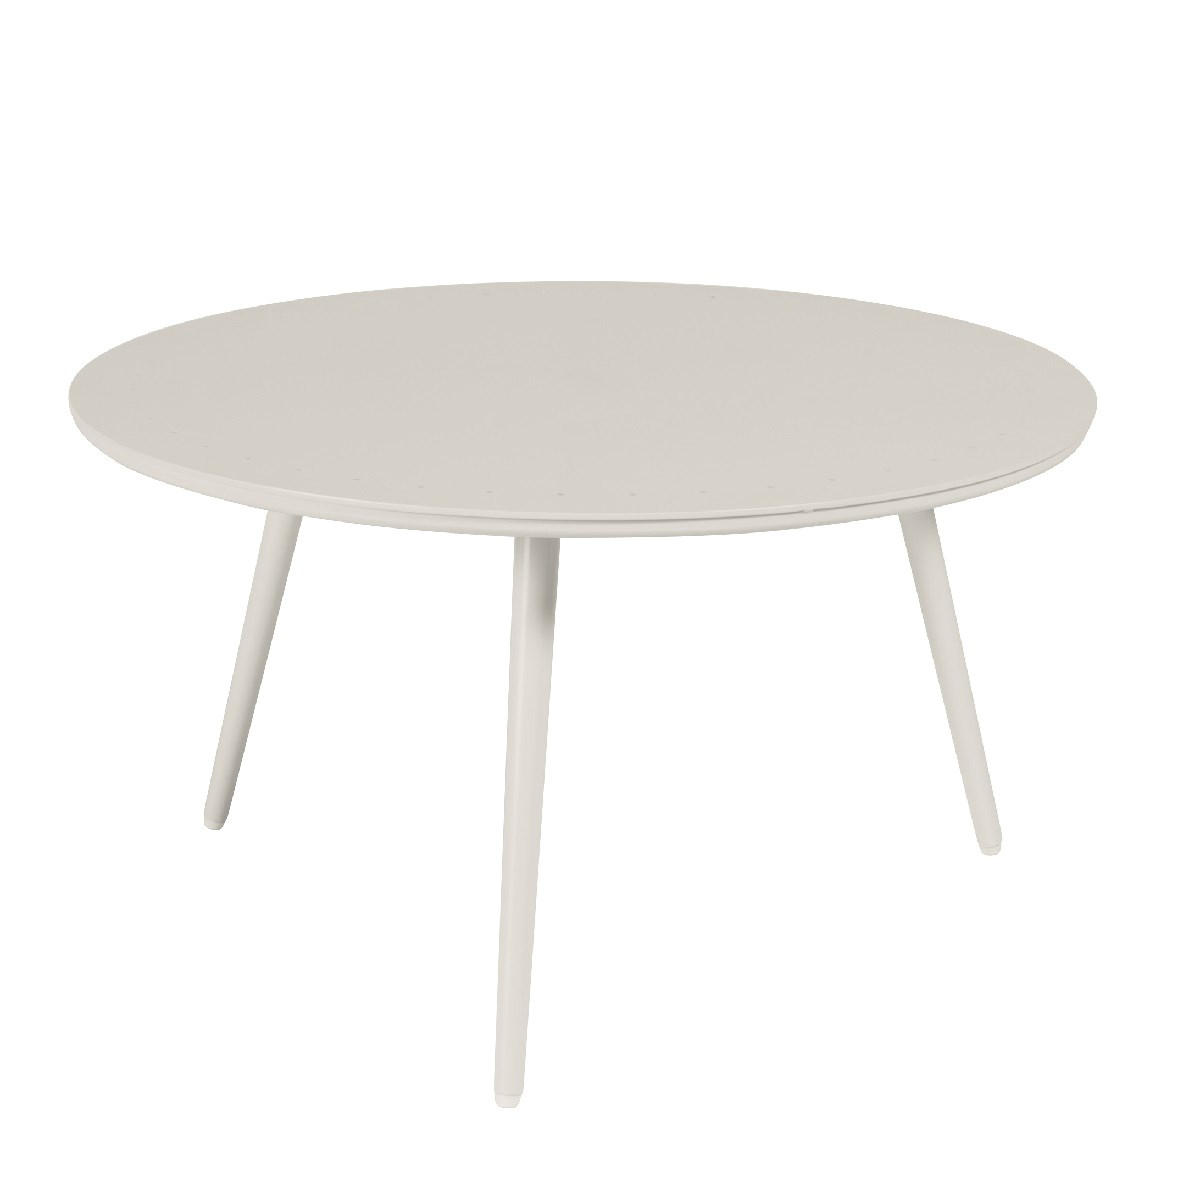 Table basse de jardin ronde en aluminium D80 beige clair